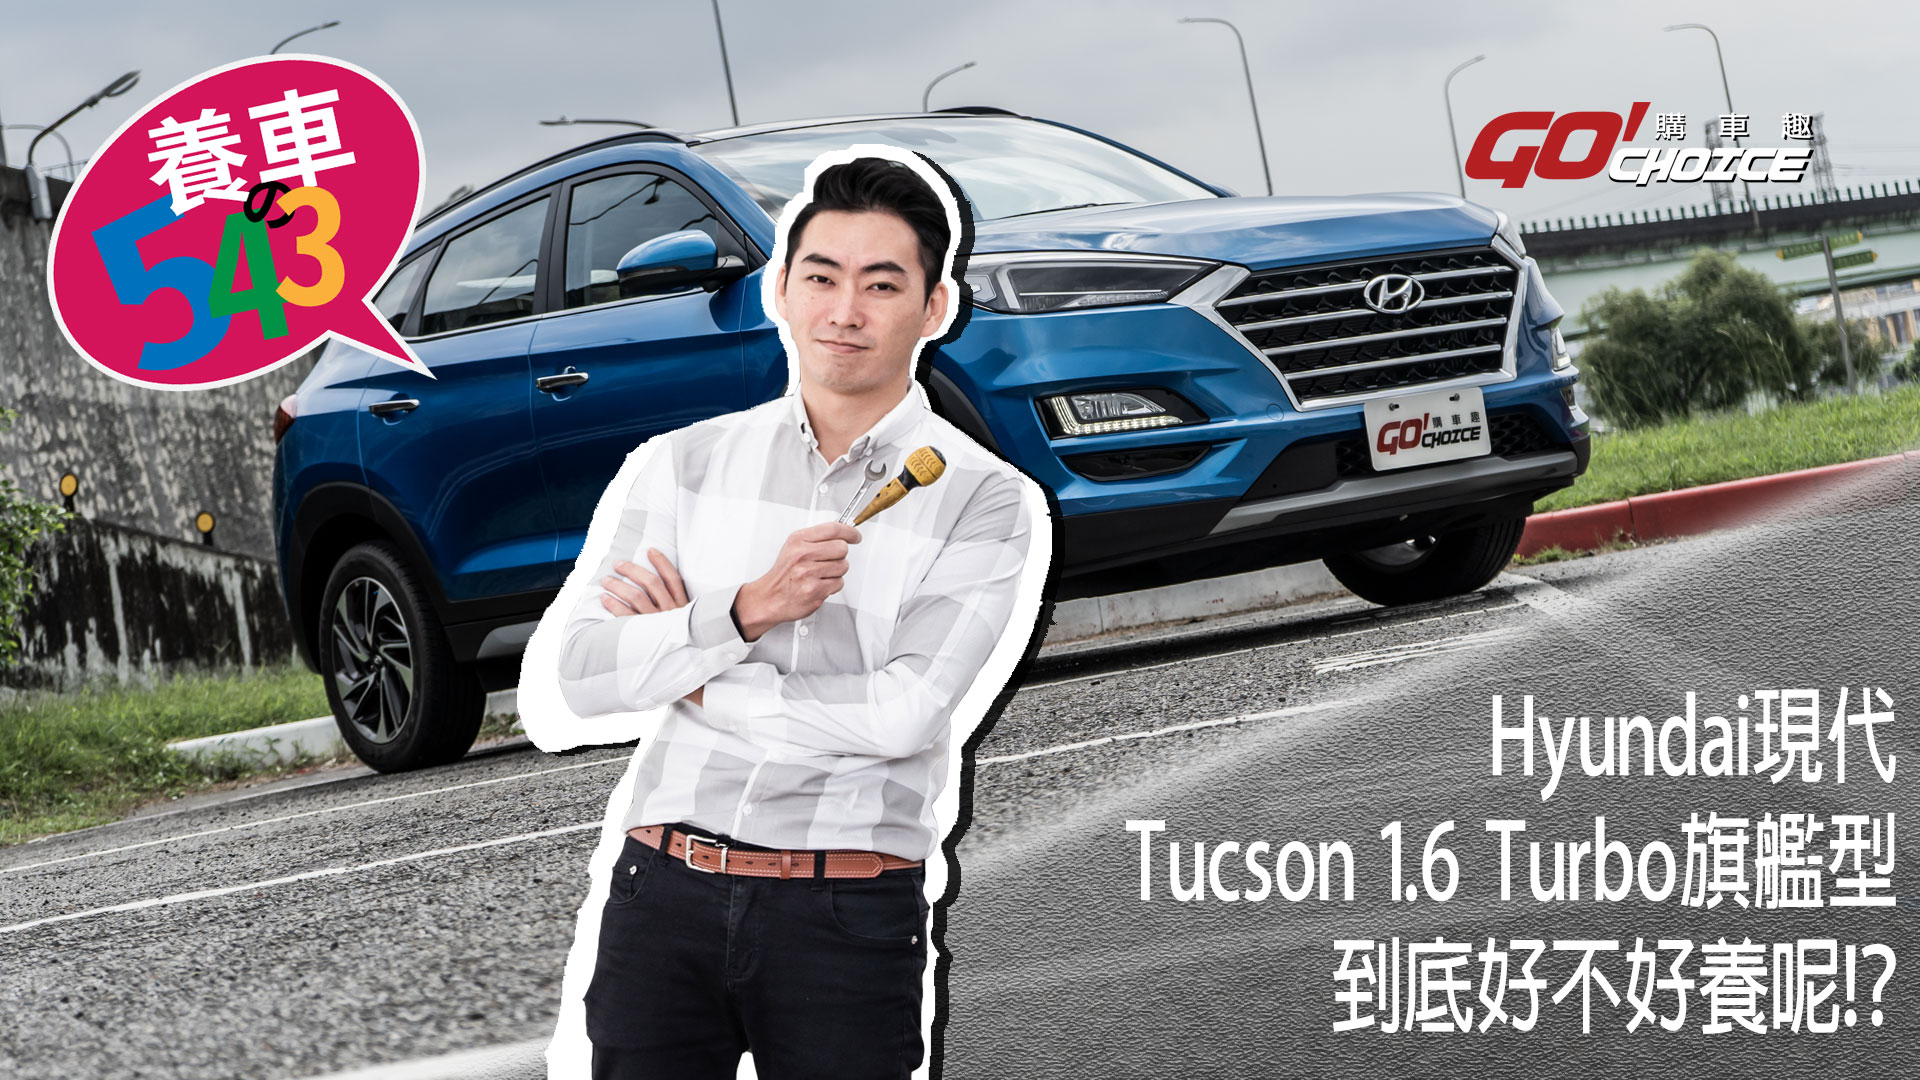 養車543-現代Hyundai Tucson 1.6 Turbo旗艦型(第十三集)